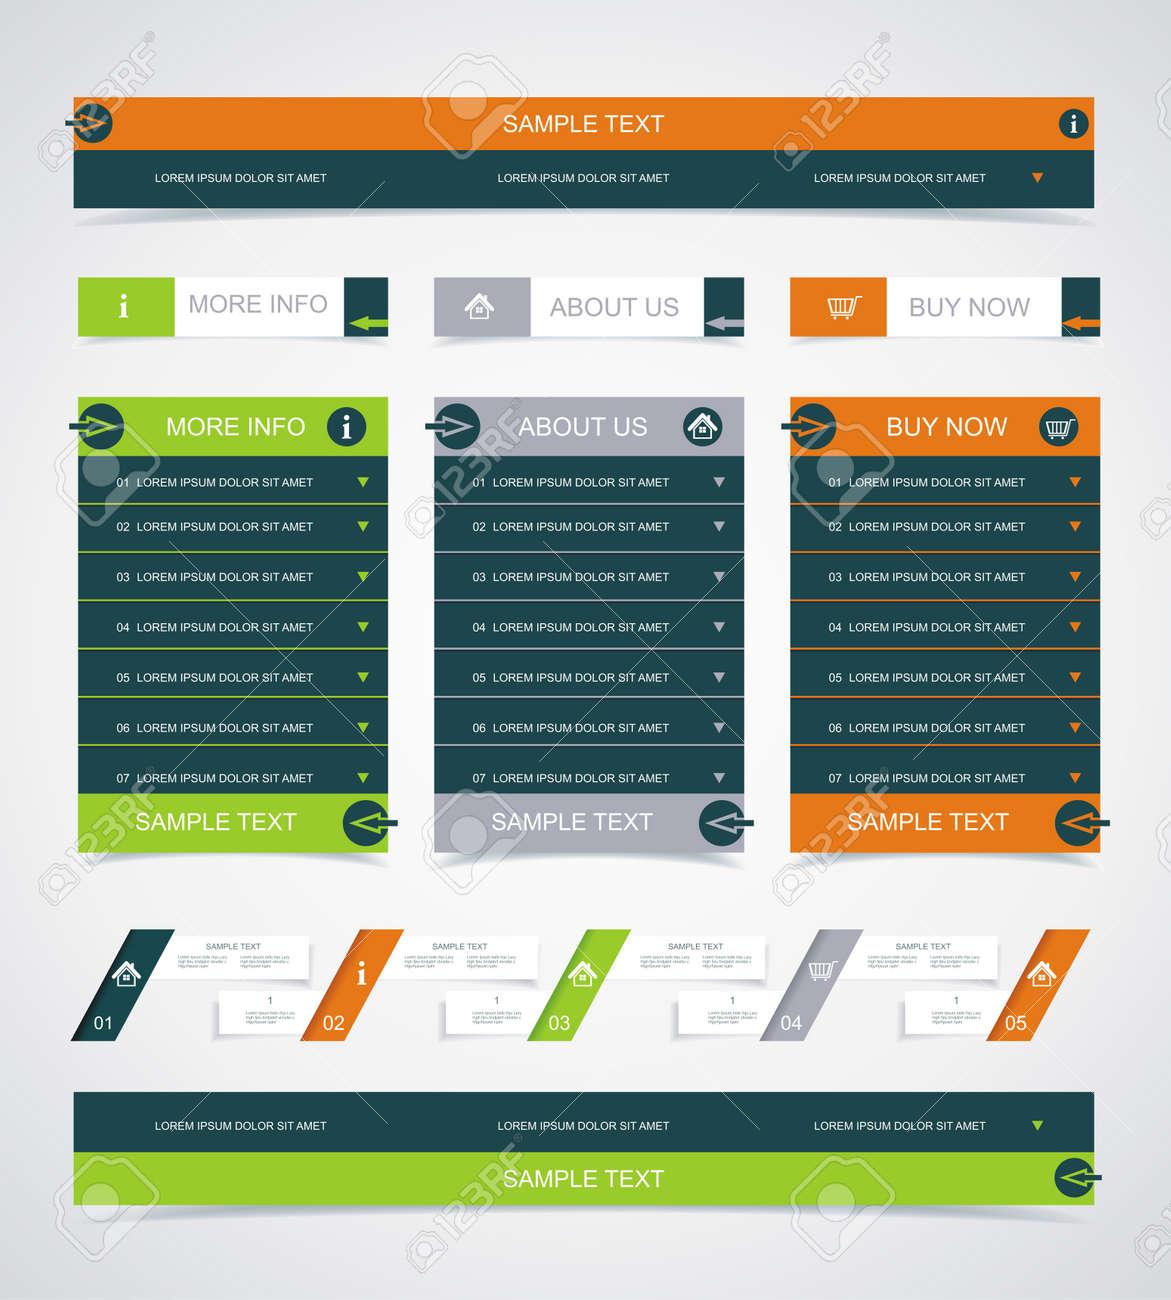 Web site design element. Stock Vector - 21995472